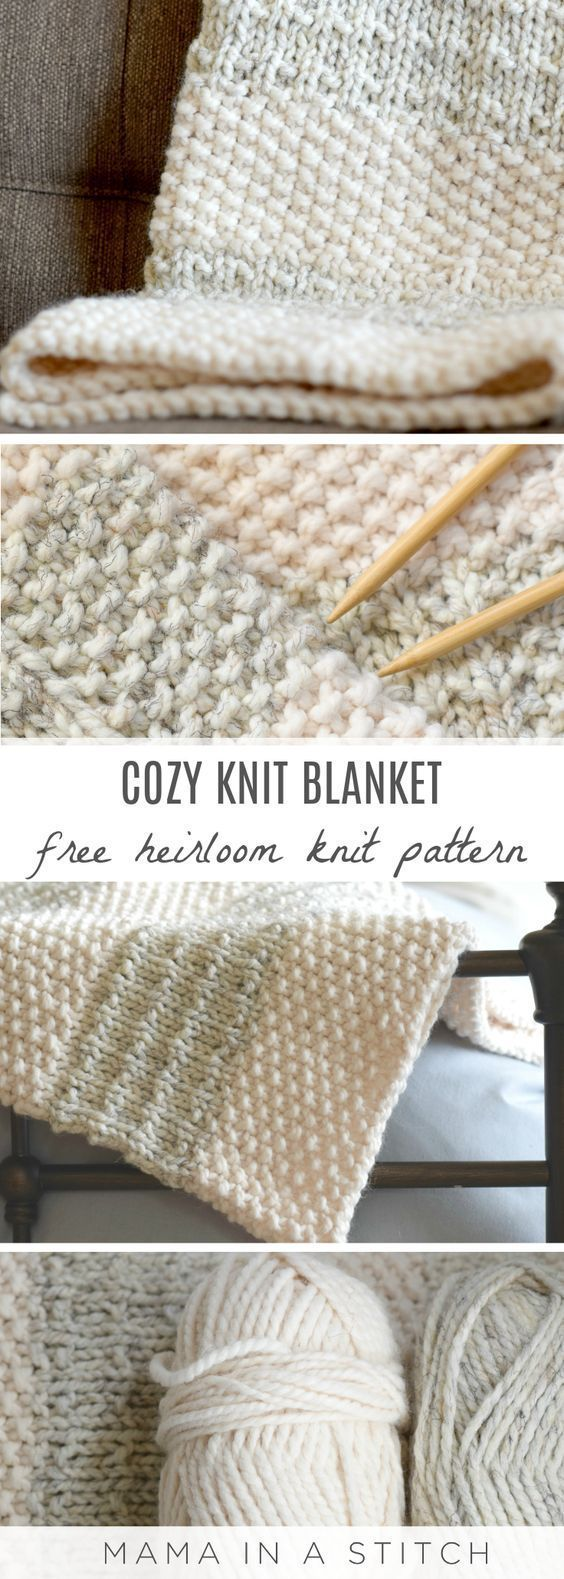 Easy Heirloom Knit Blanket Pattern | Strick | Pinterest